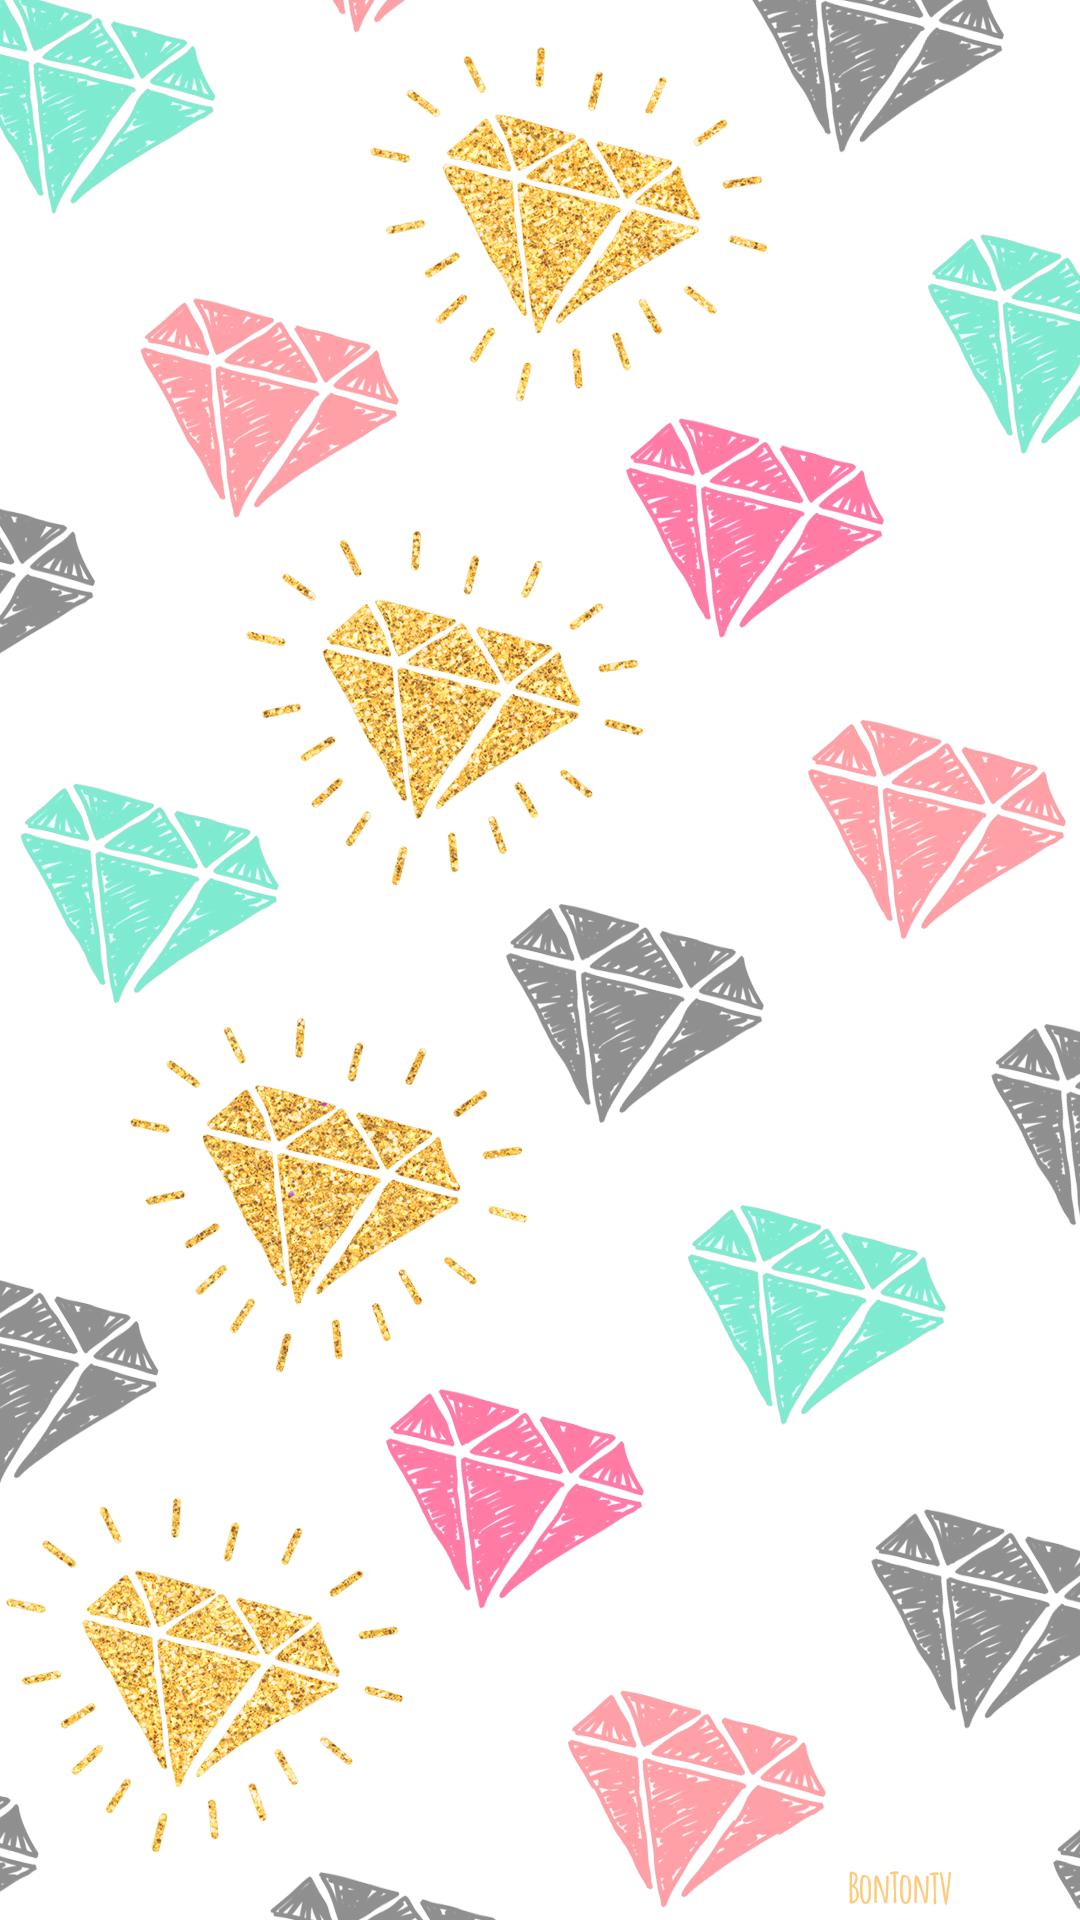 Hd Phone Wallpapers Diamonds By Bonton Tv Free Backgrounds 1080x1920 Wallpapers Iphone S Diamond Wallpaper Iphone Cellphone Wallpaper Diamond Wallpaper